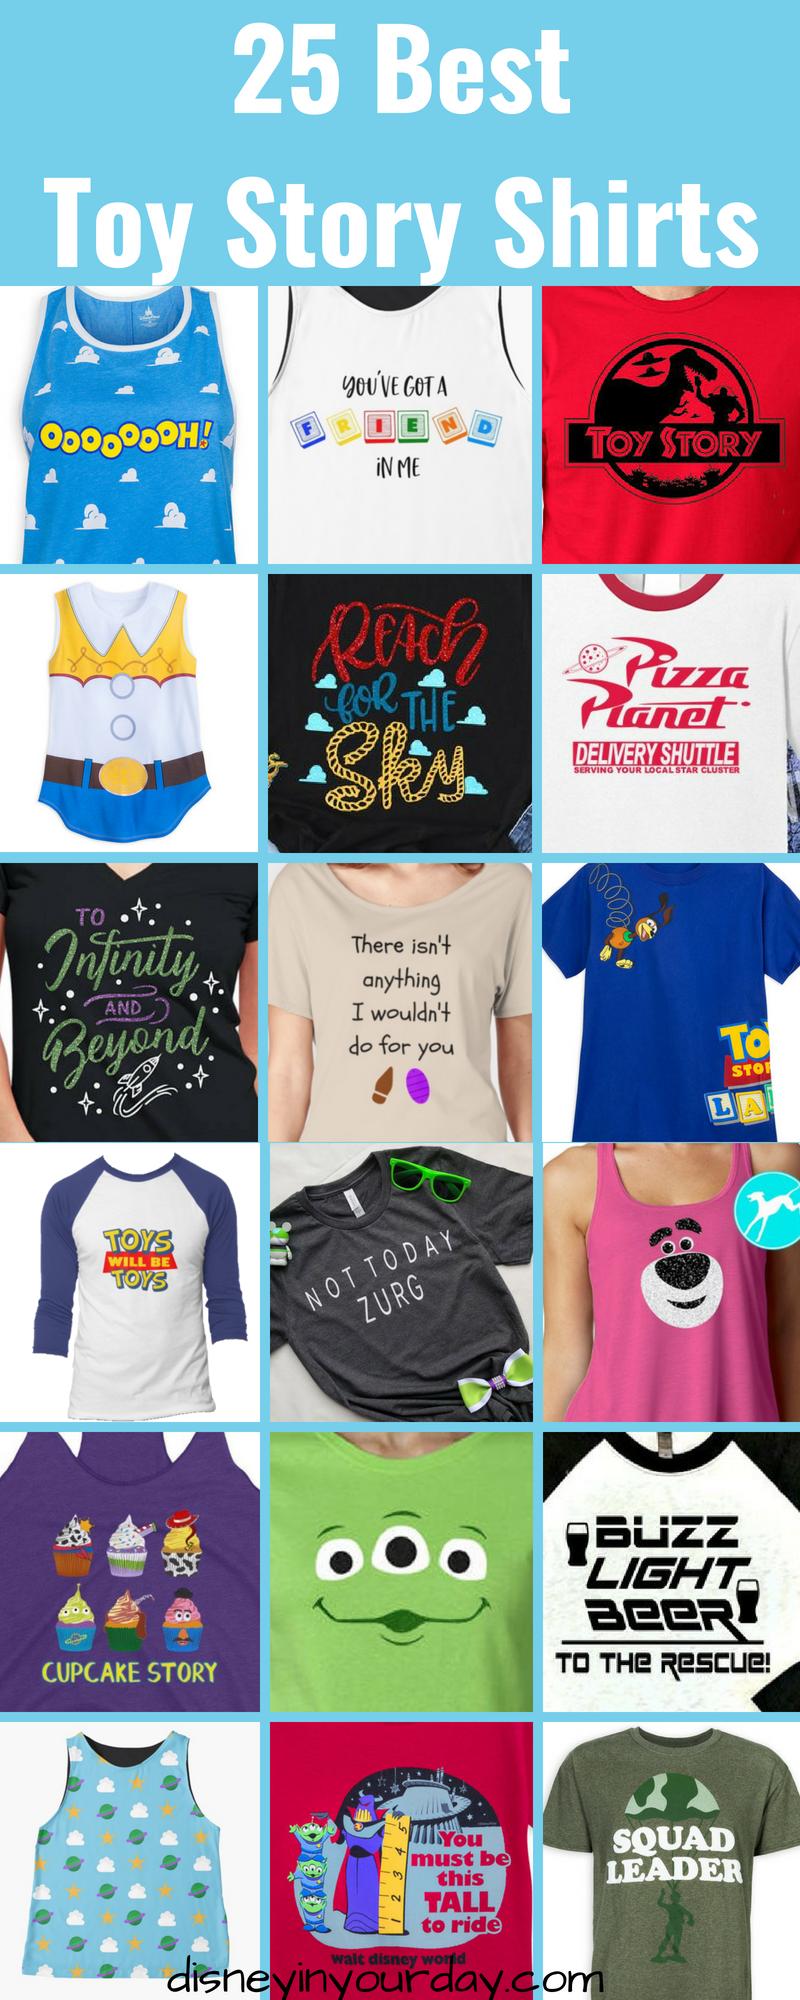 25 Best Disney Furniture Ideas On Pinterest: 25 Best Toy Story Shirts